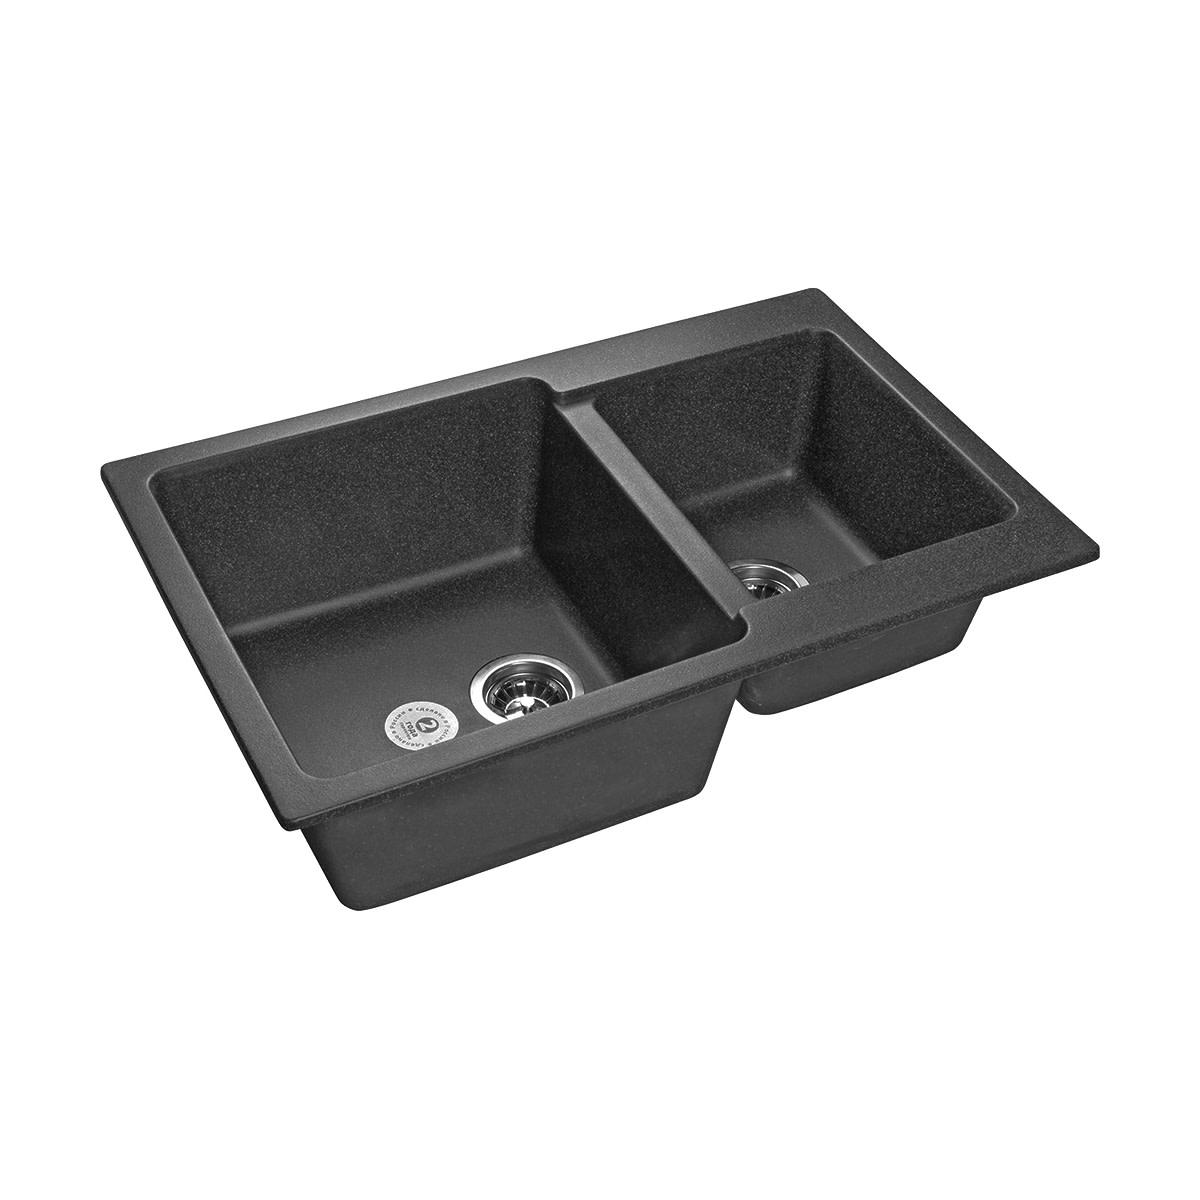 Кухонная мойка GranFest P-780 K PRACTIKP-780 K граф